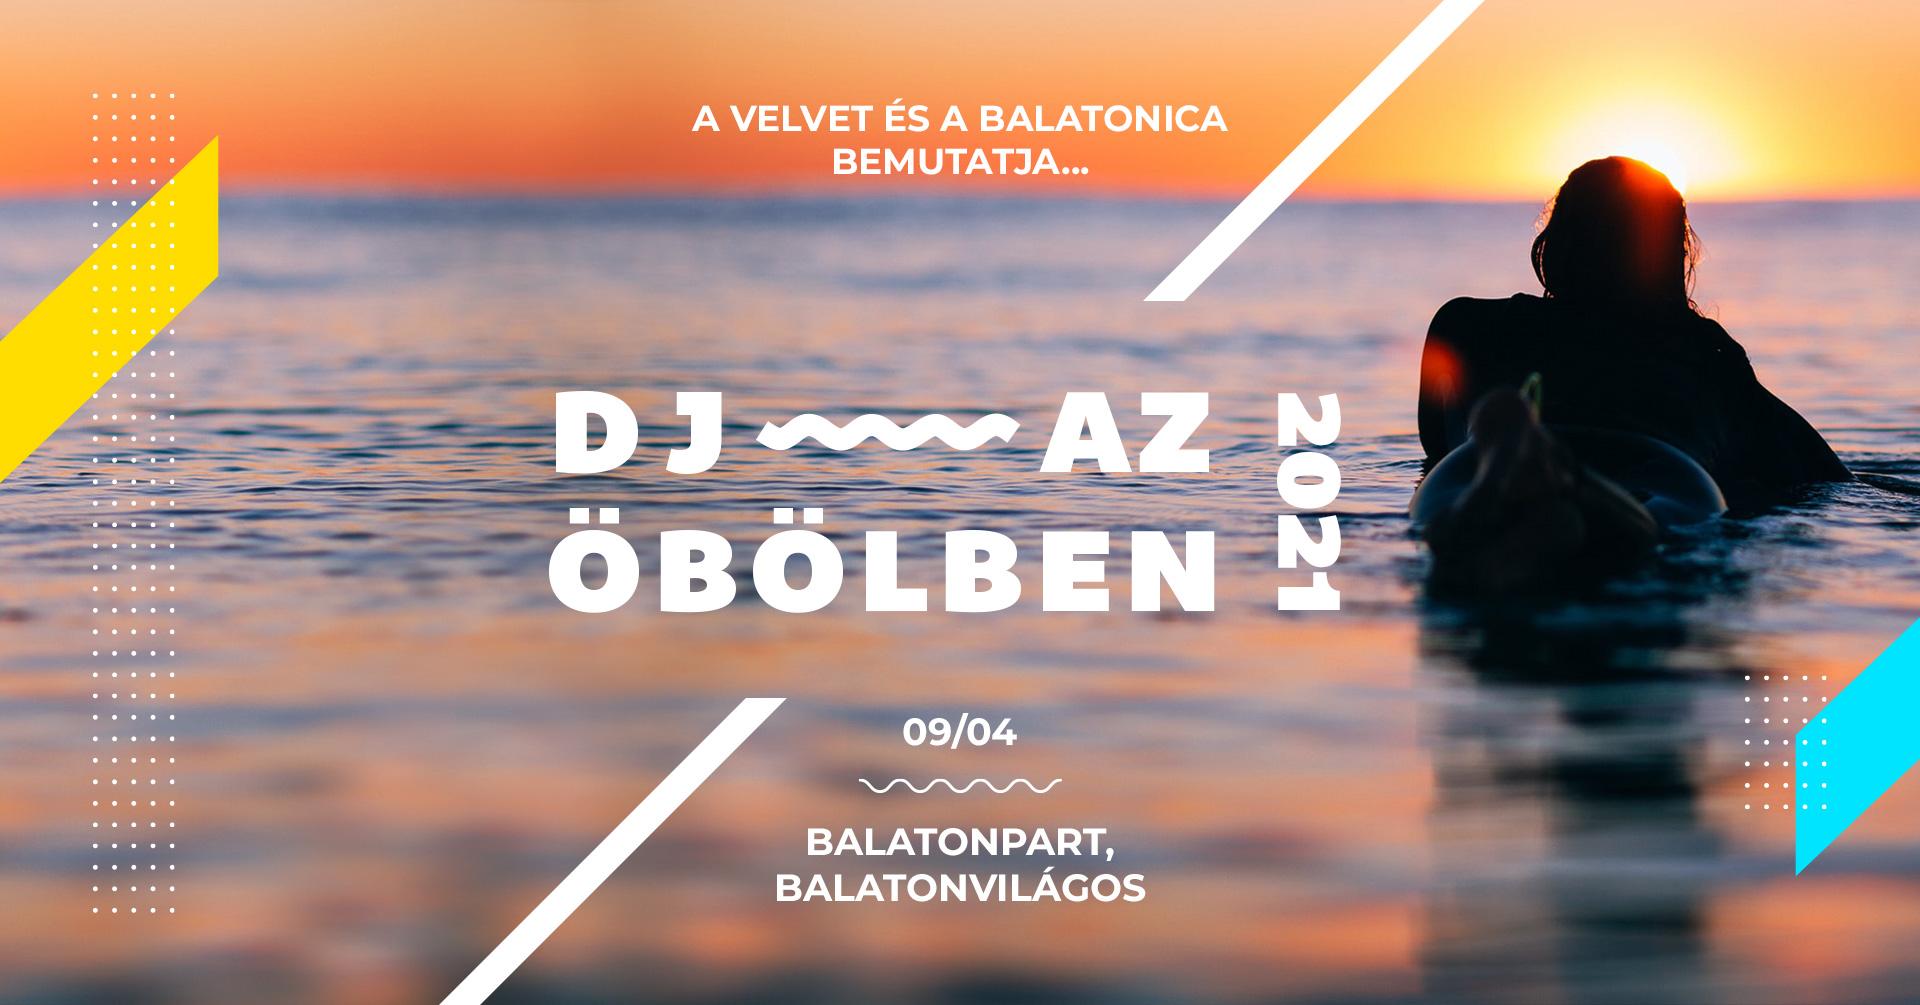 Ibizai chillout hangulatot hoz Magyarországra a balatoni webrádió